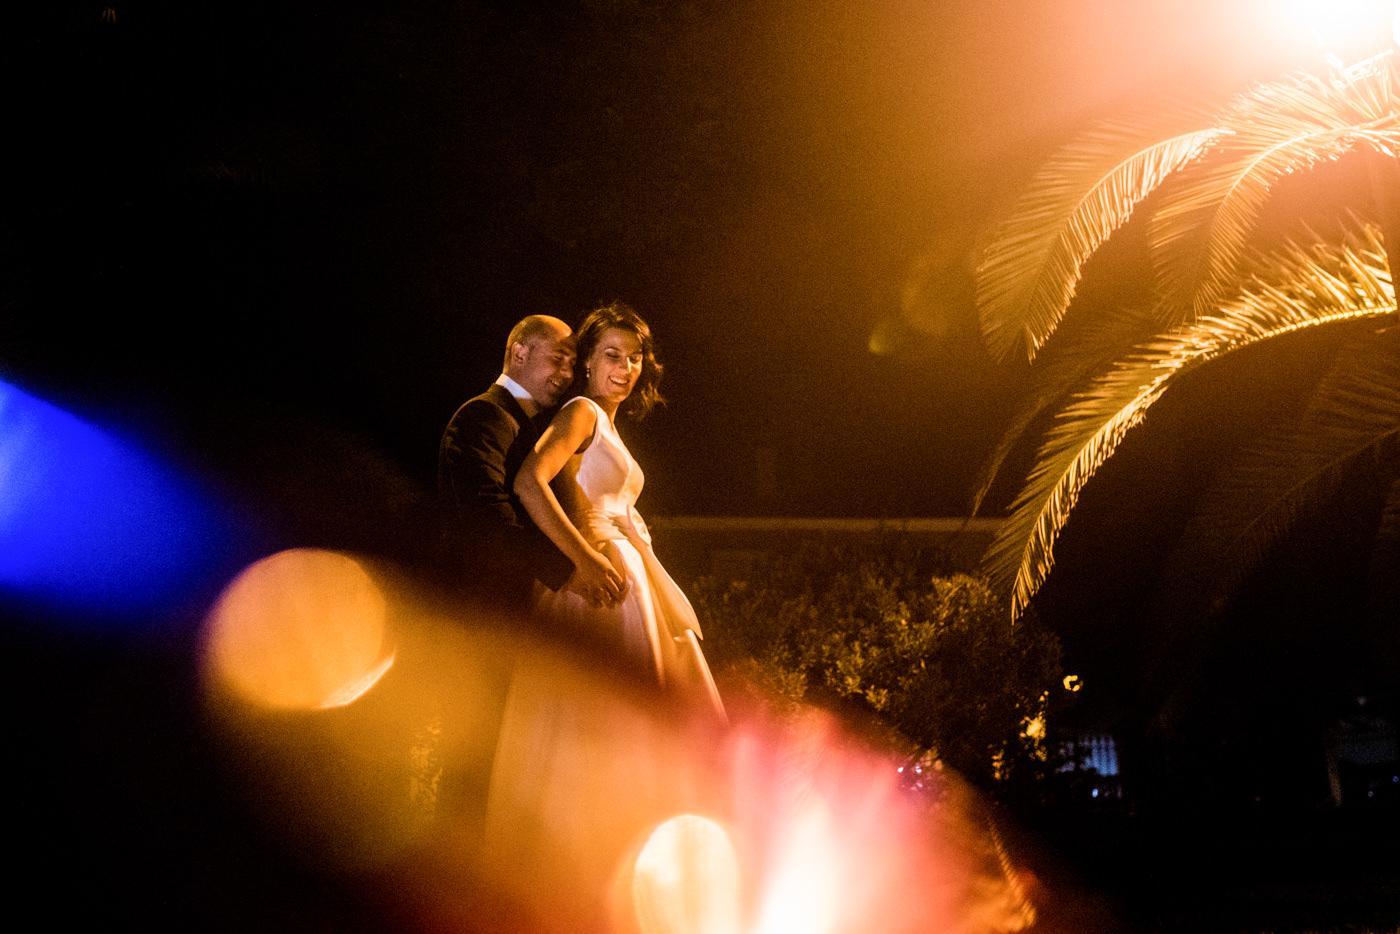 fotografias de boda fin del mundo